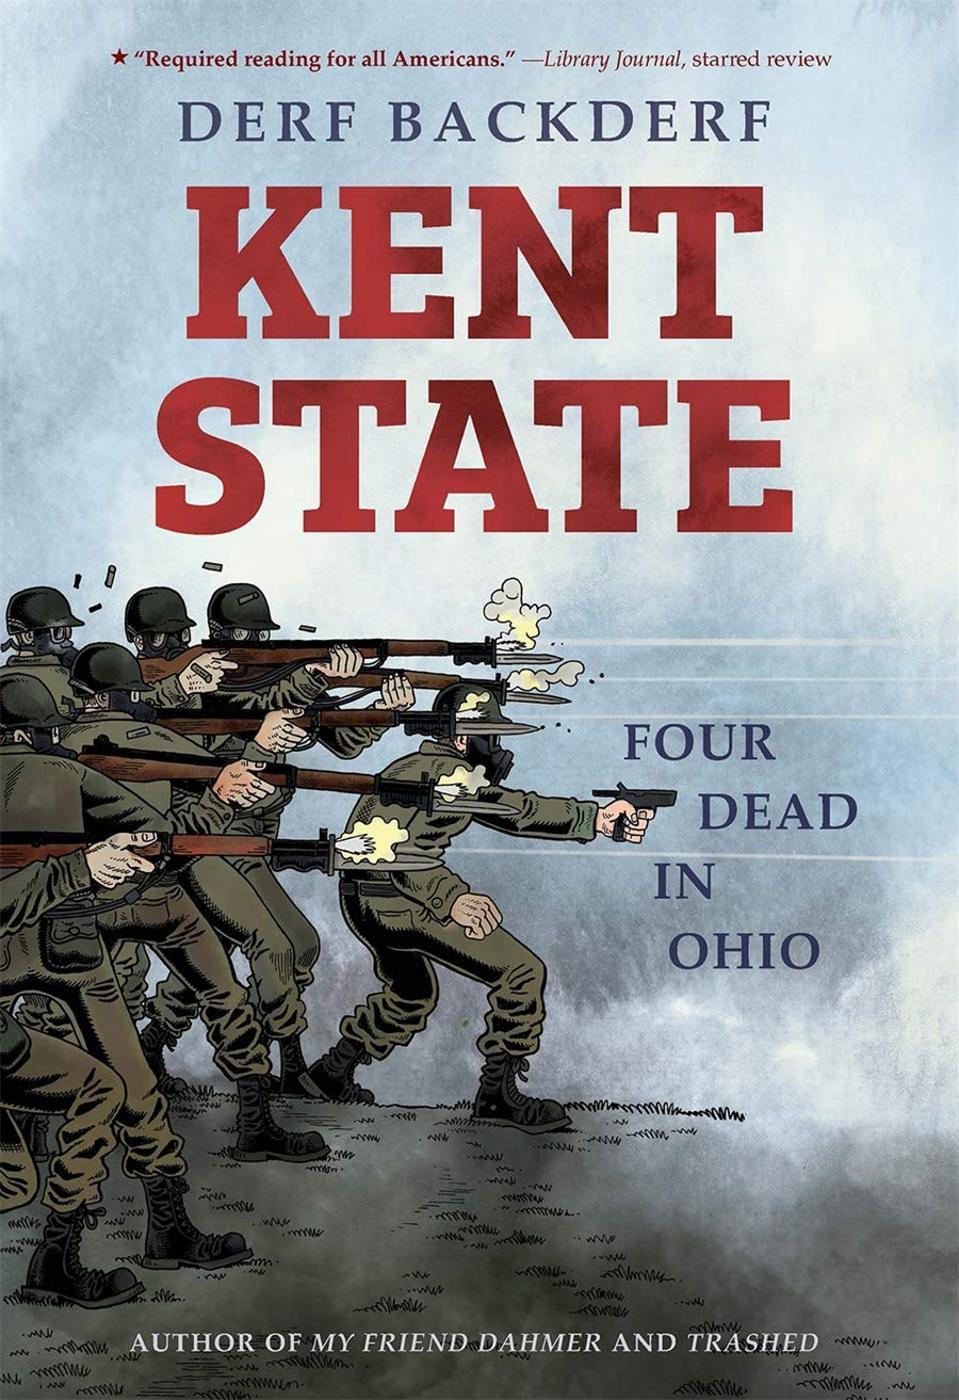 Cover to Kent State historical graphic novel Derf Backderf 2020